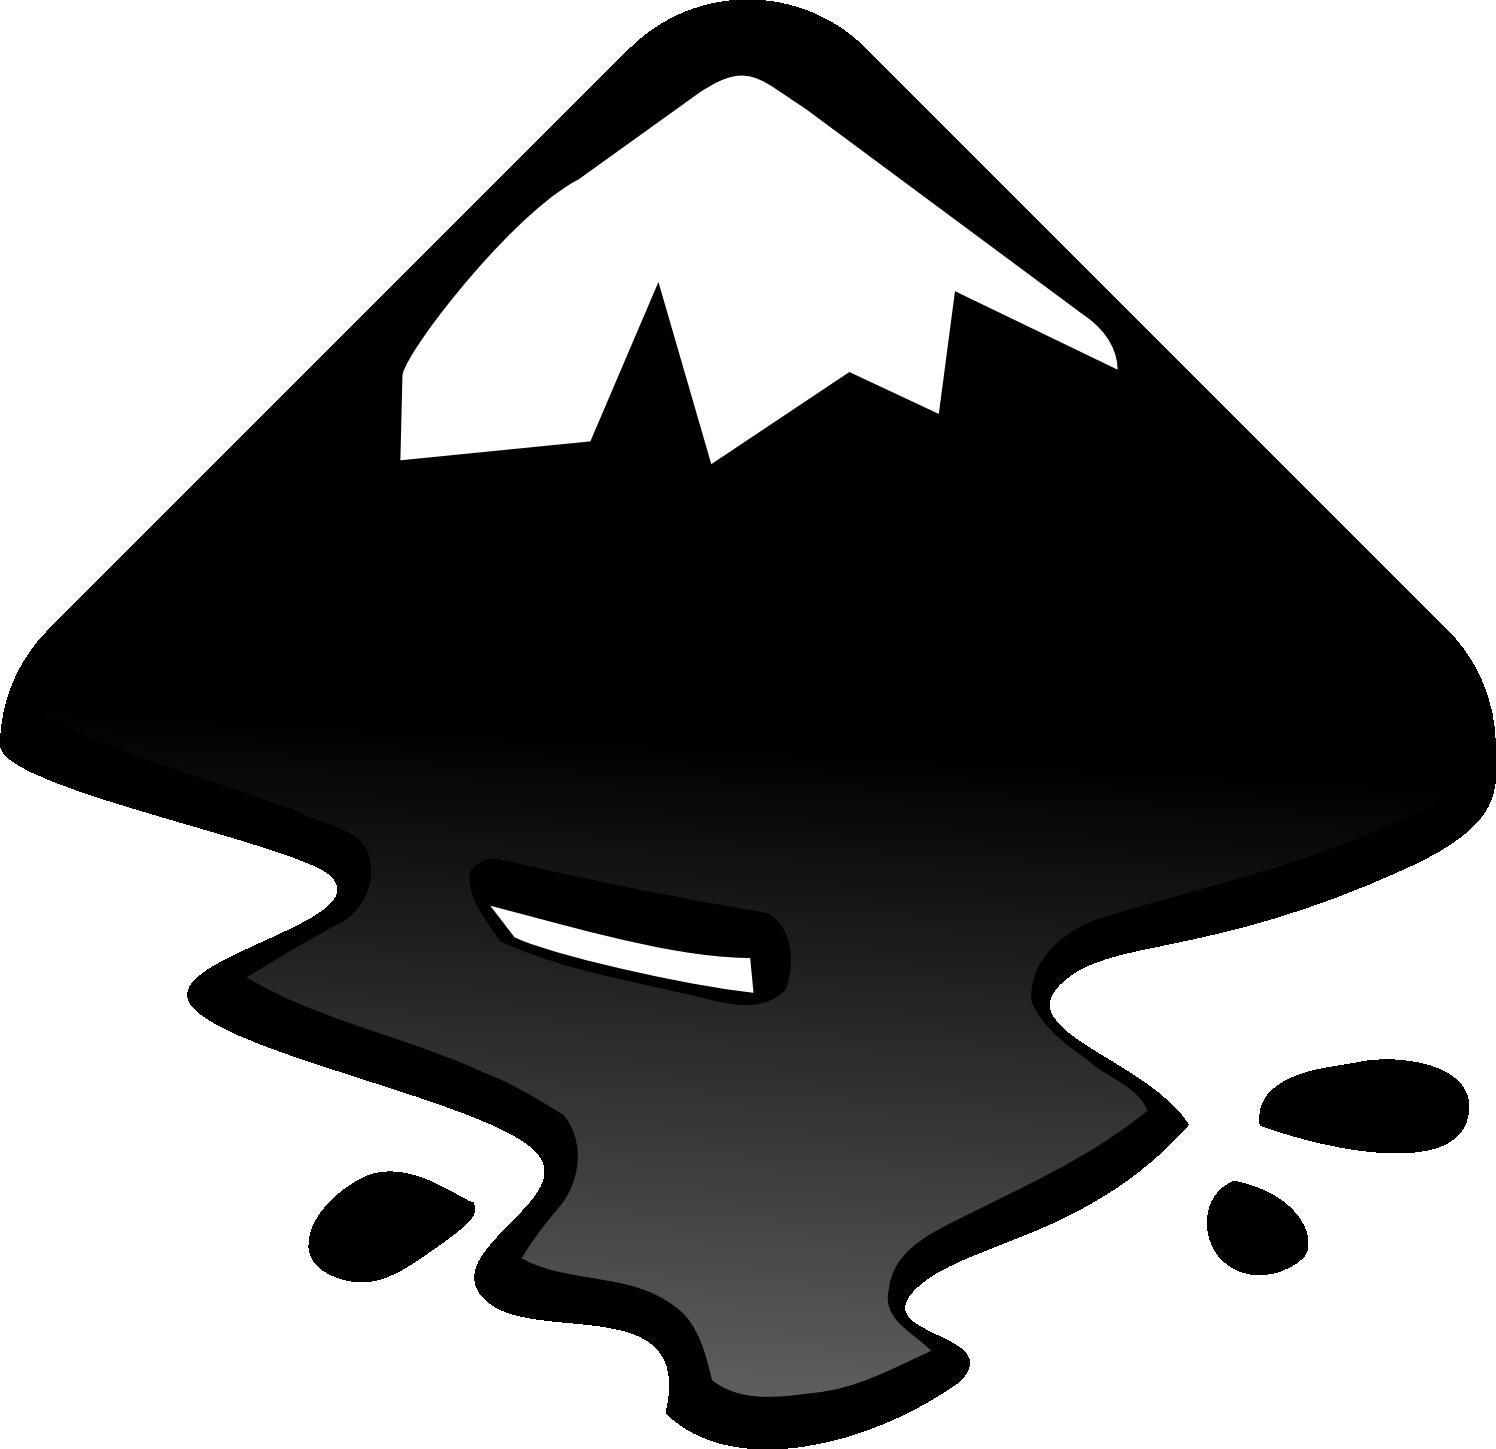 inkscape-logo-40.png?nocache=1309011029704